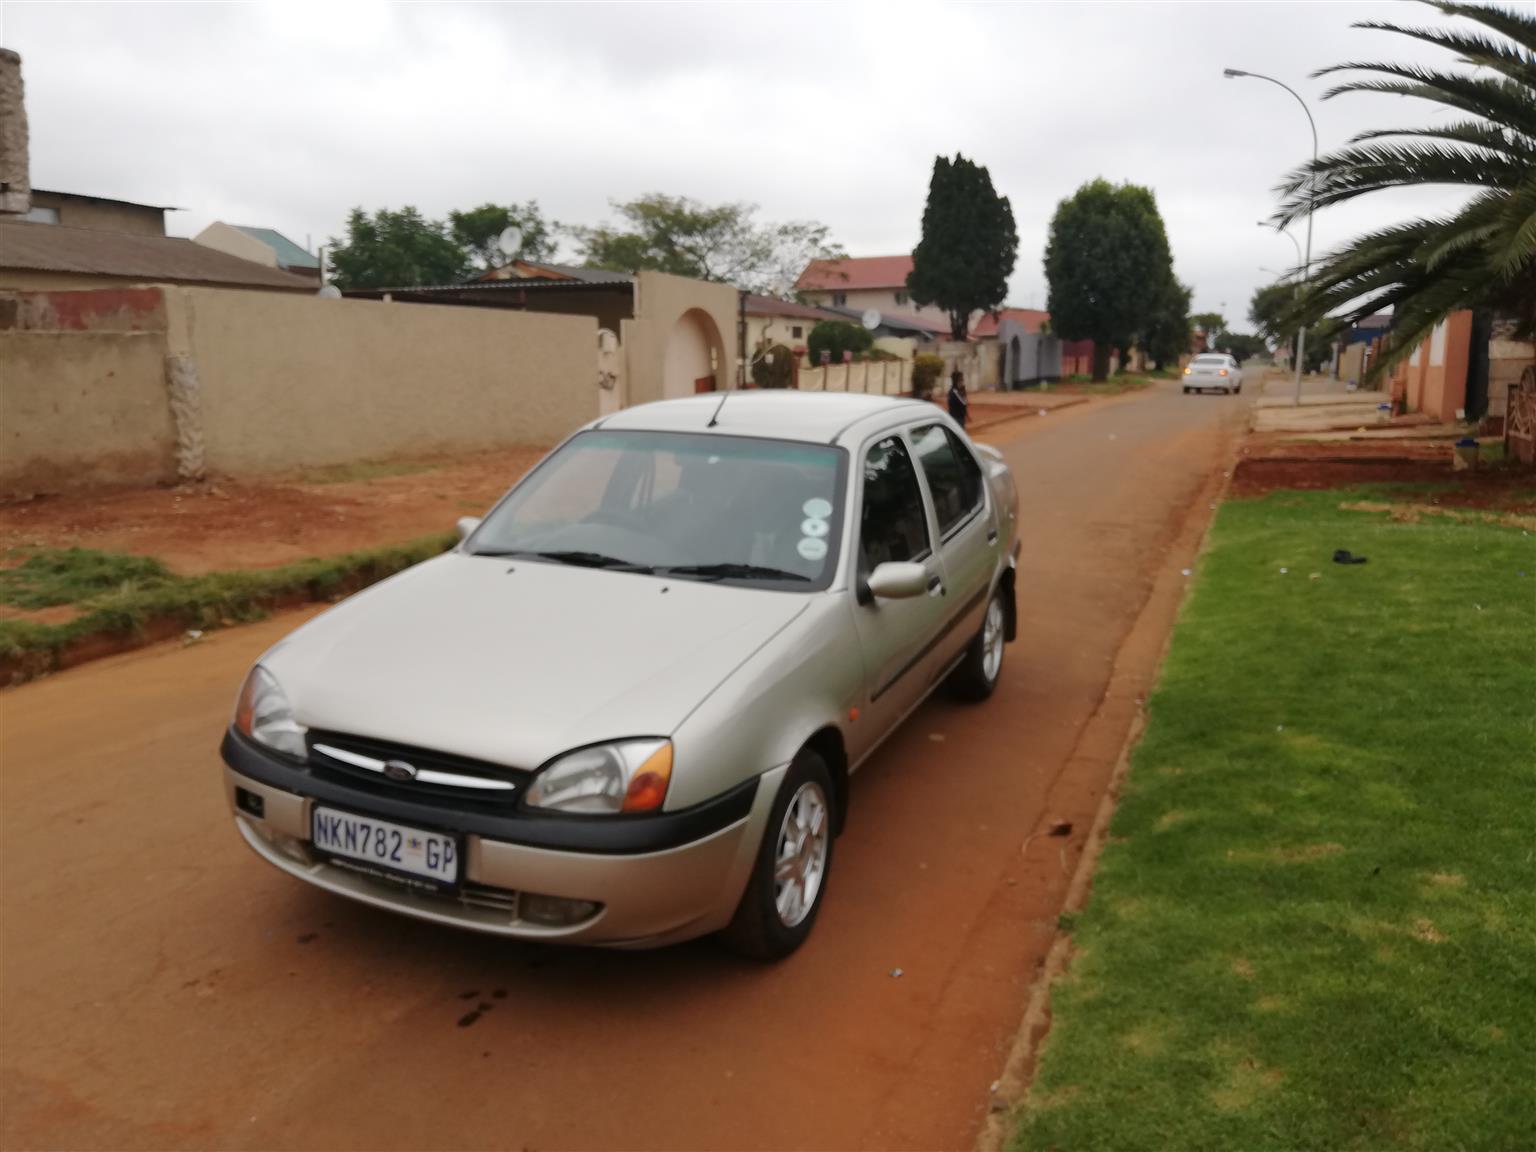 2002 Ford Ikon 1.6i CLX